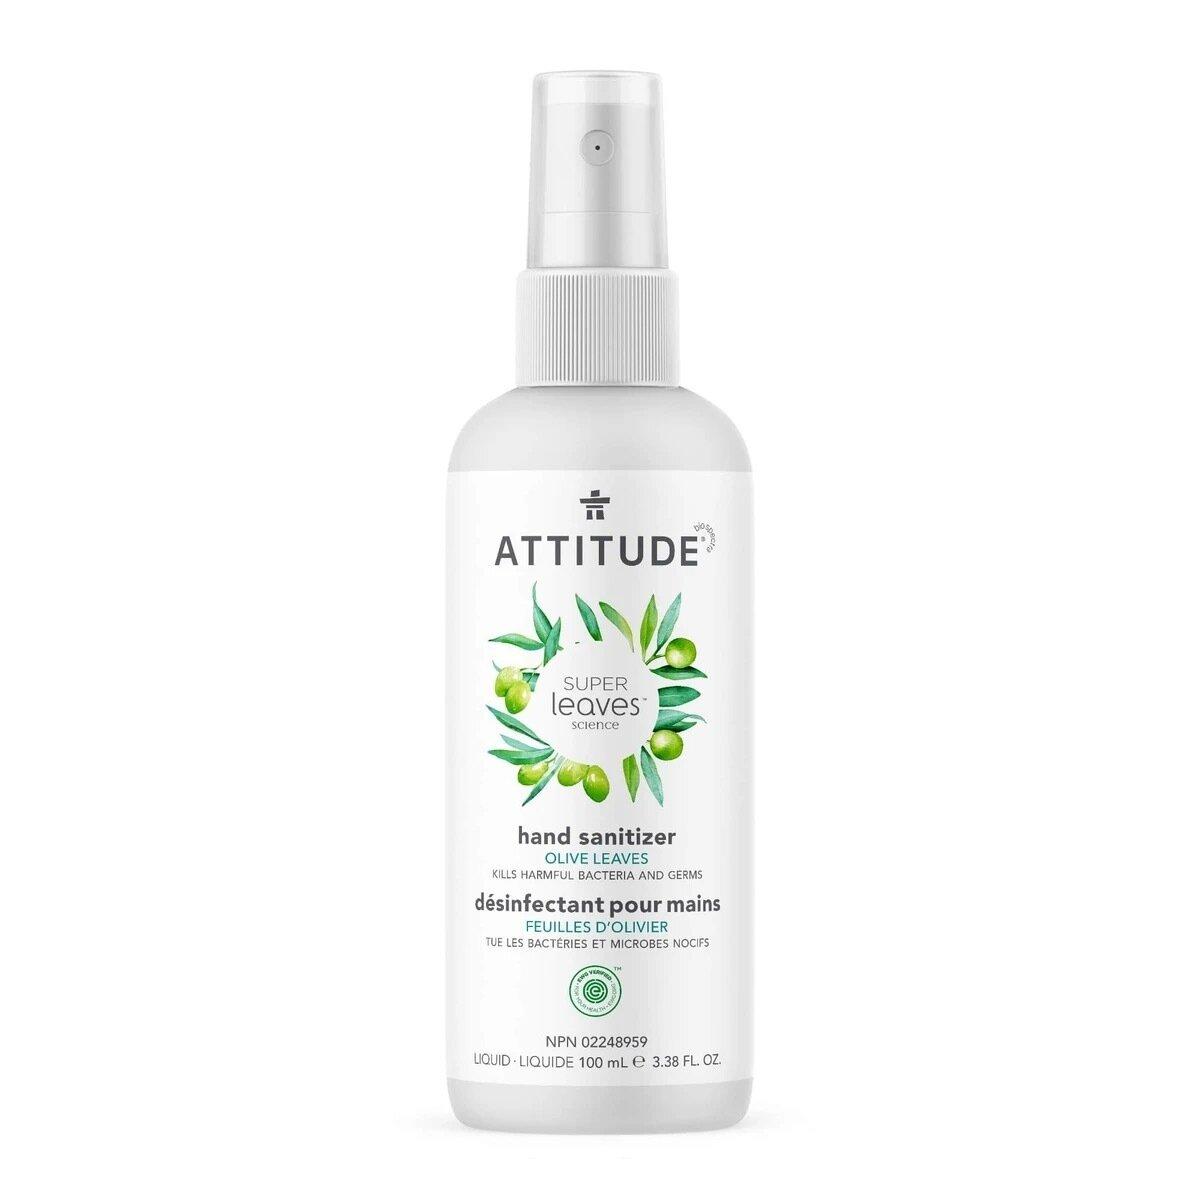 Attitude - Hand Sanitizer Olive Leaves  100ml